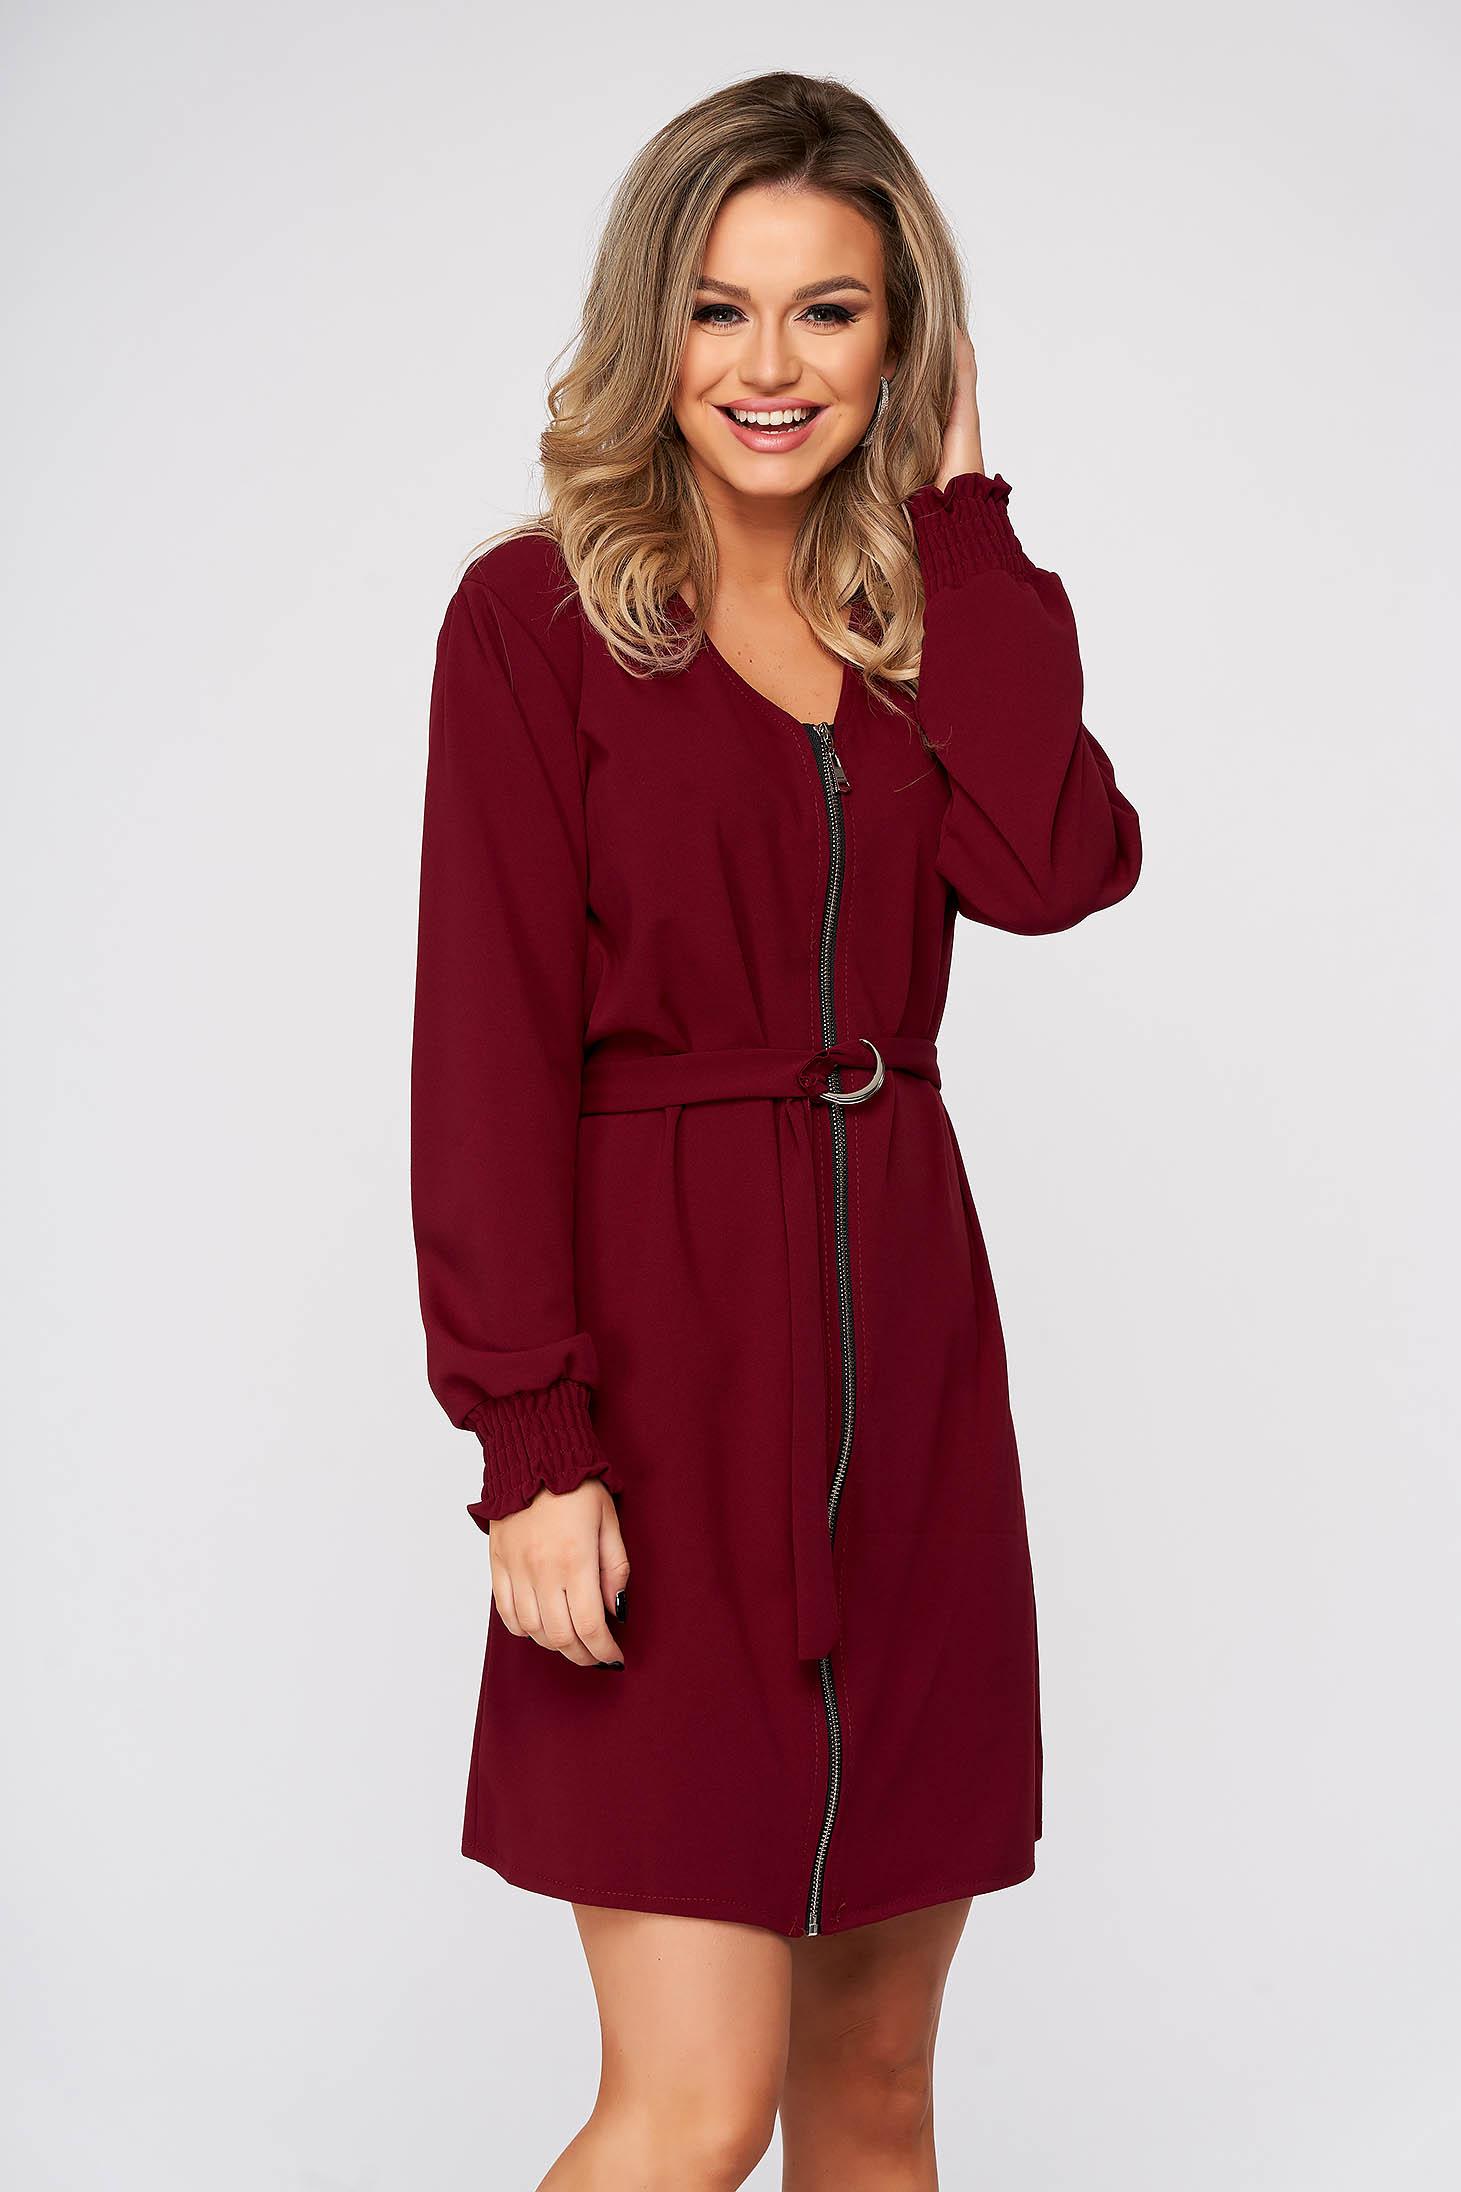 Burgundy dress daily straight with v-neckline accessorized with tied waistband